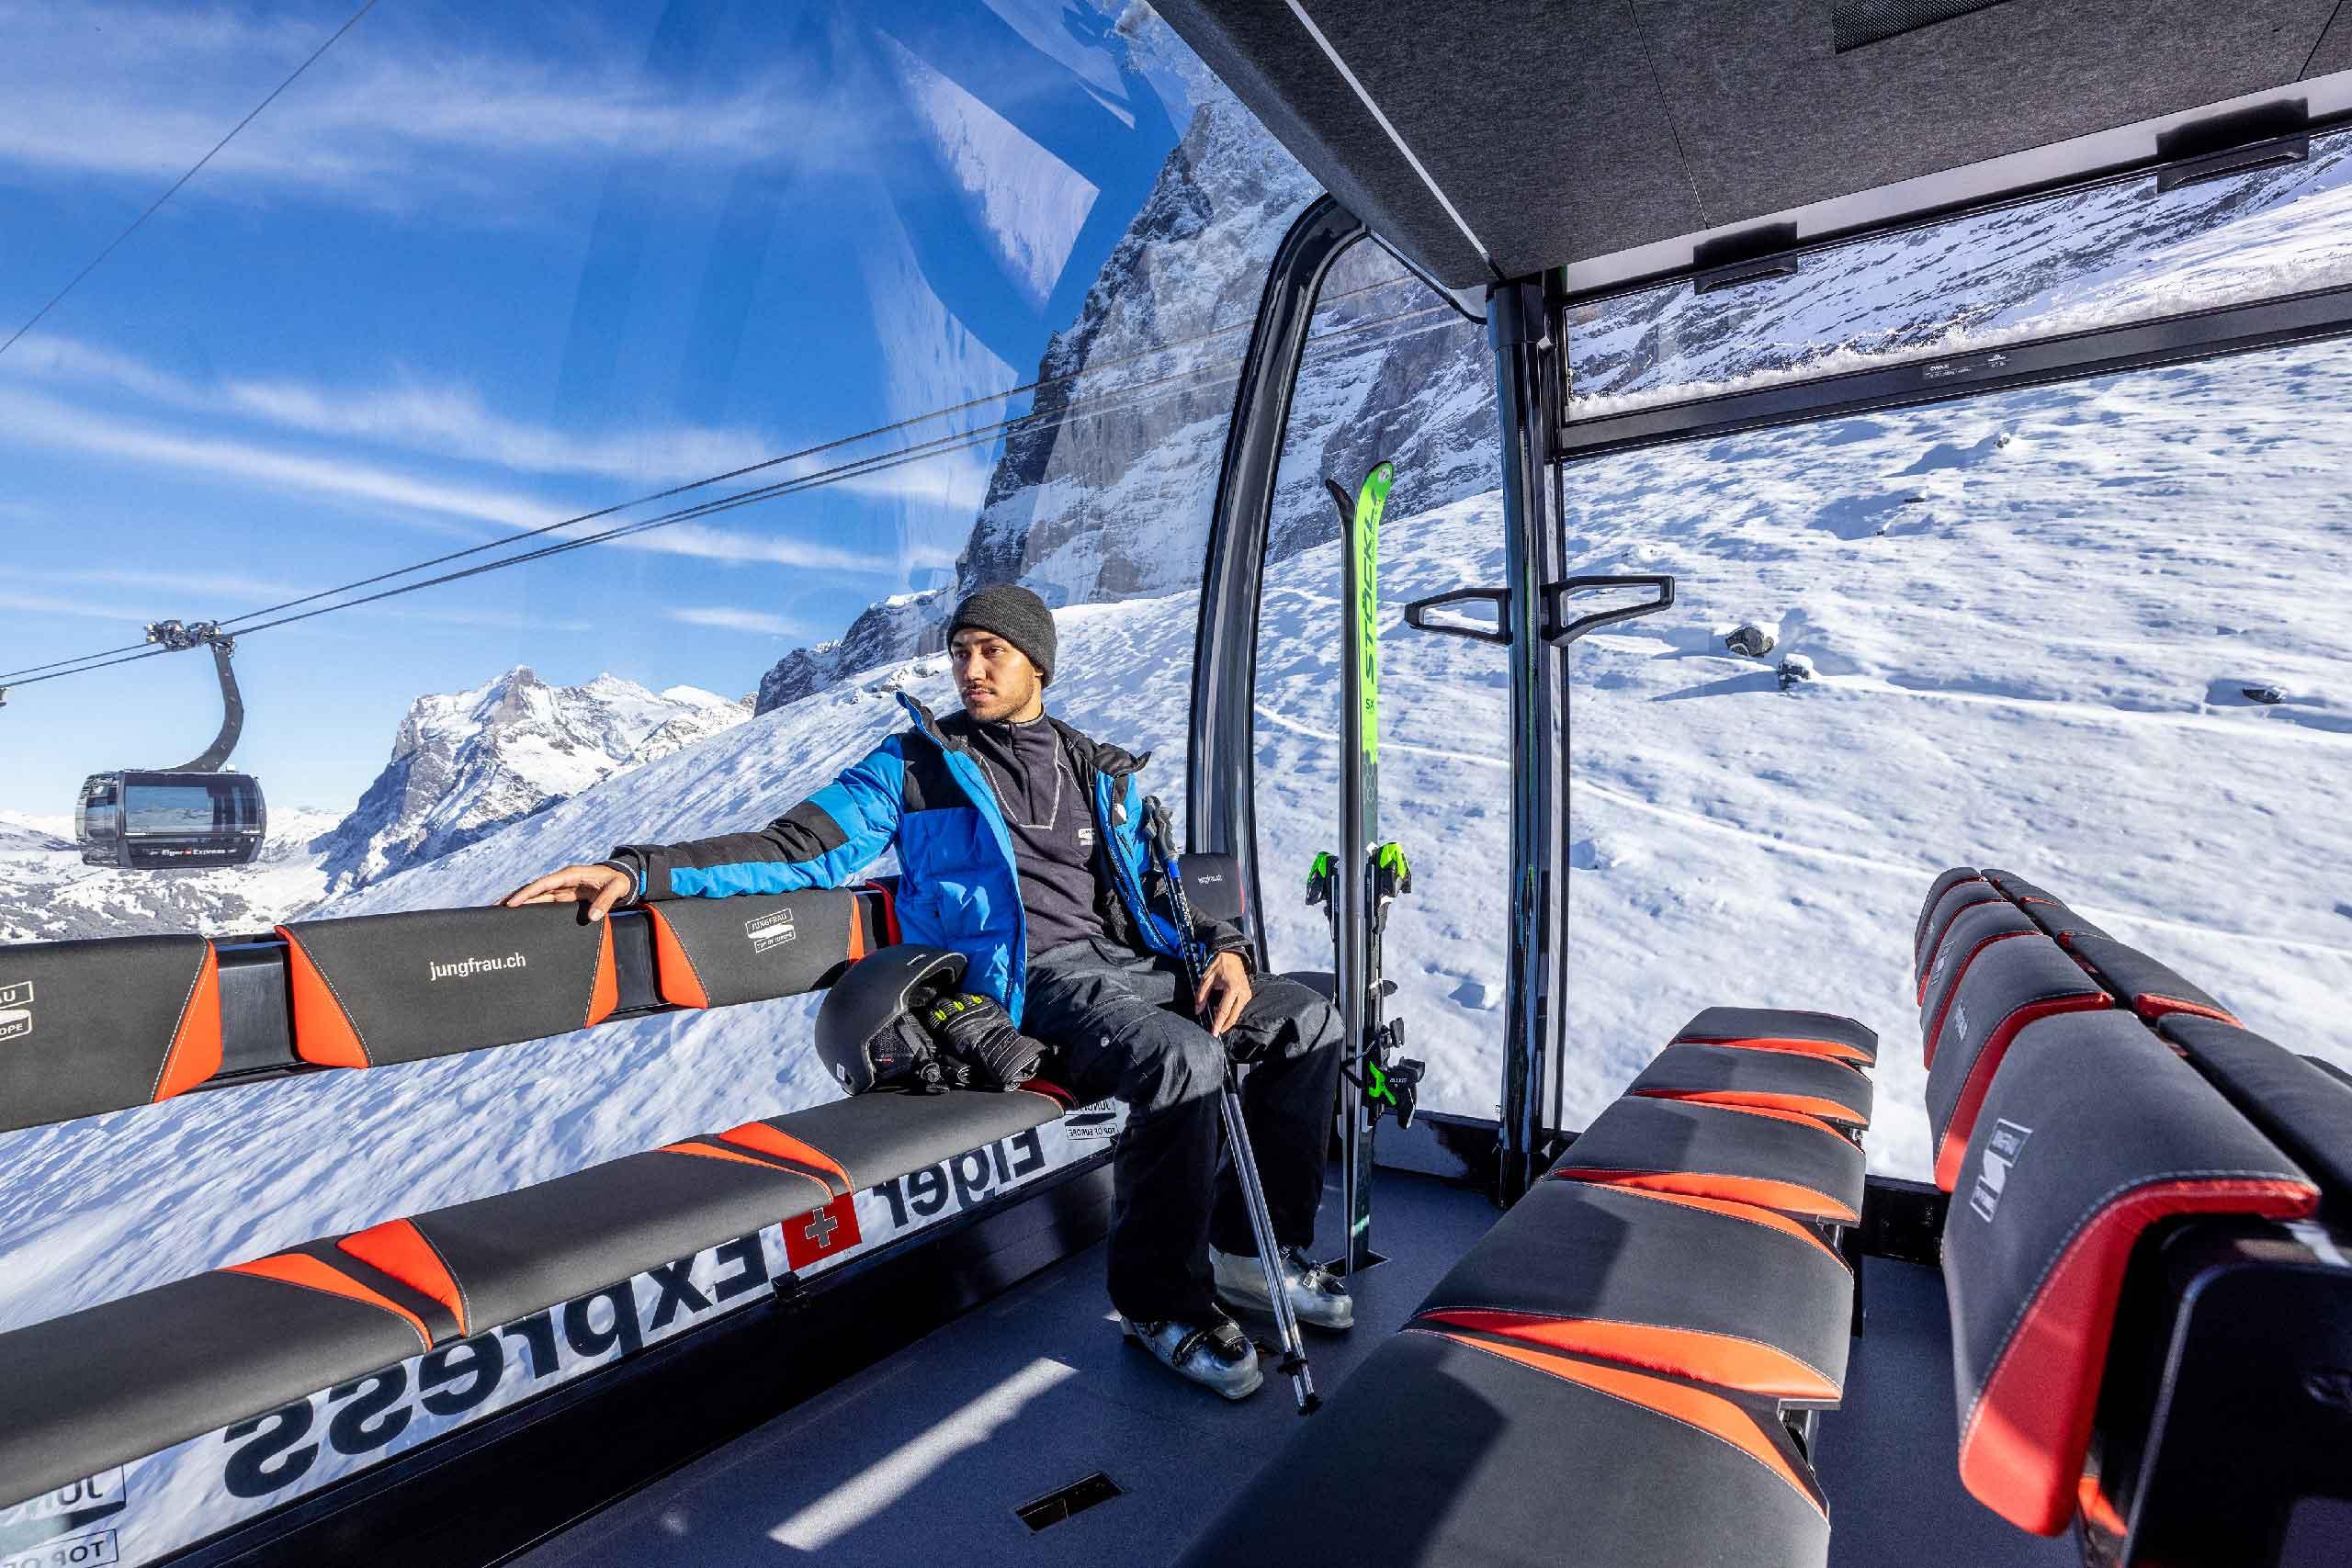 eiger-express-gondel-winter-skifahrer.jpg